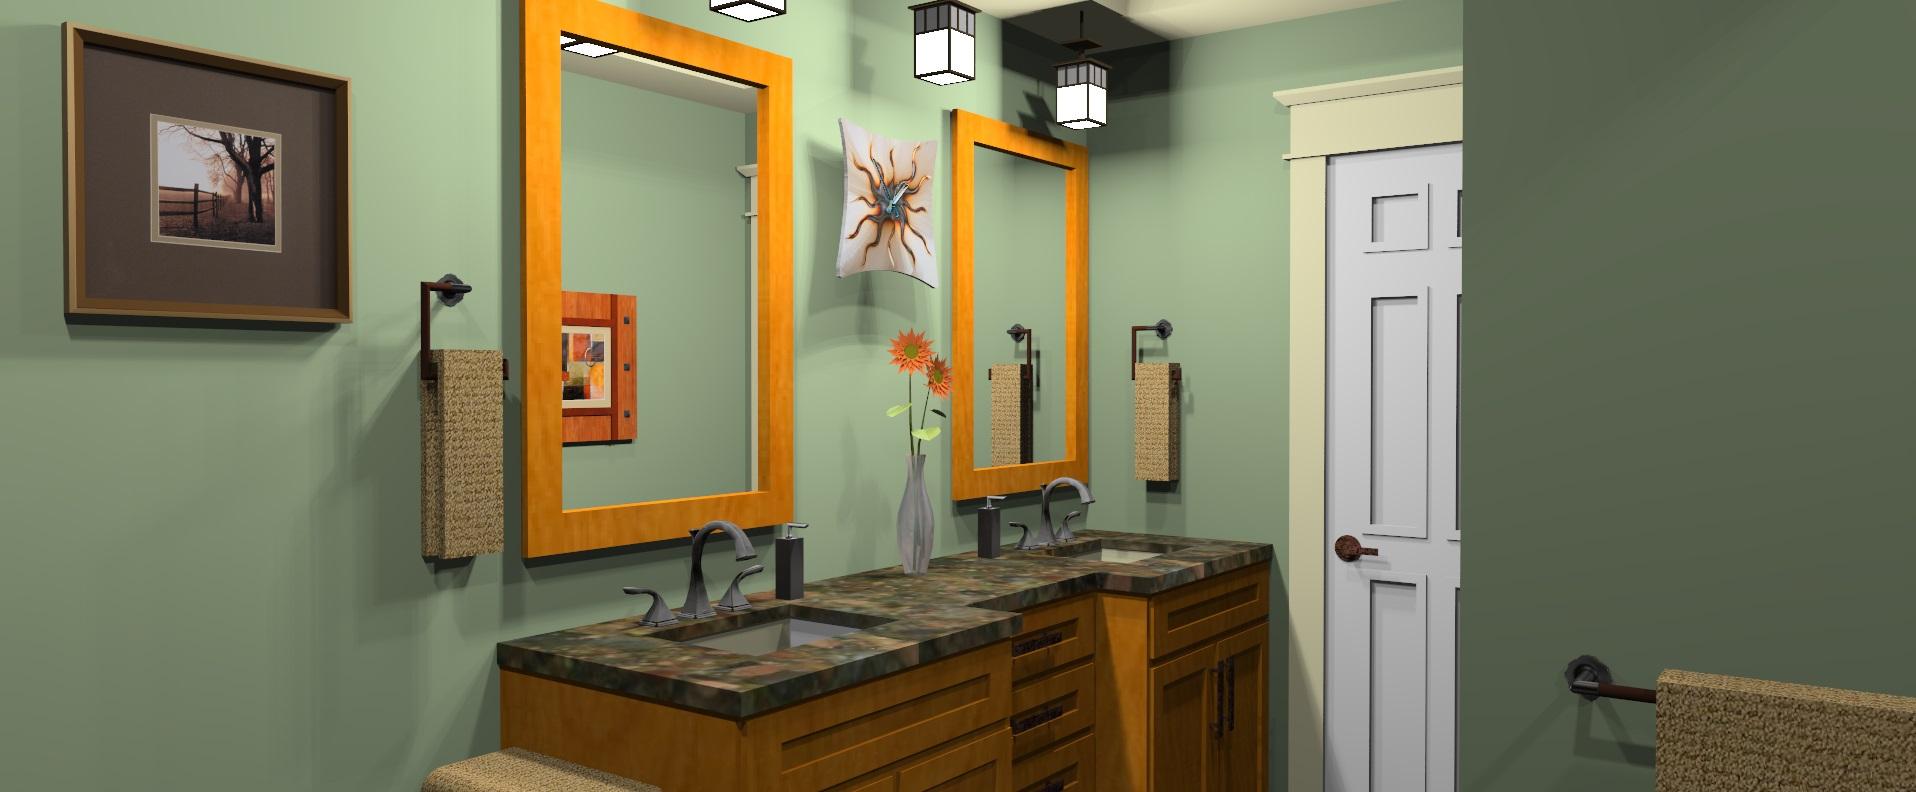 Proposed Bathroom Renovation (Rendering)